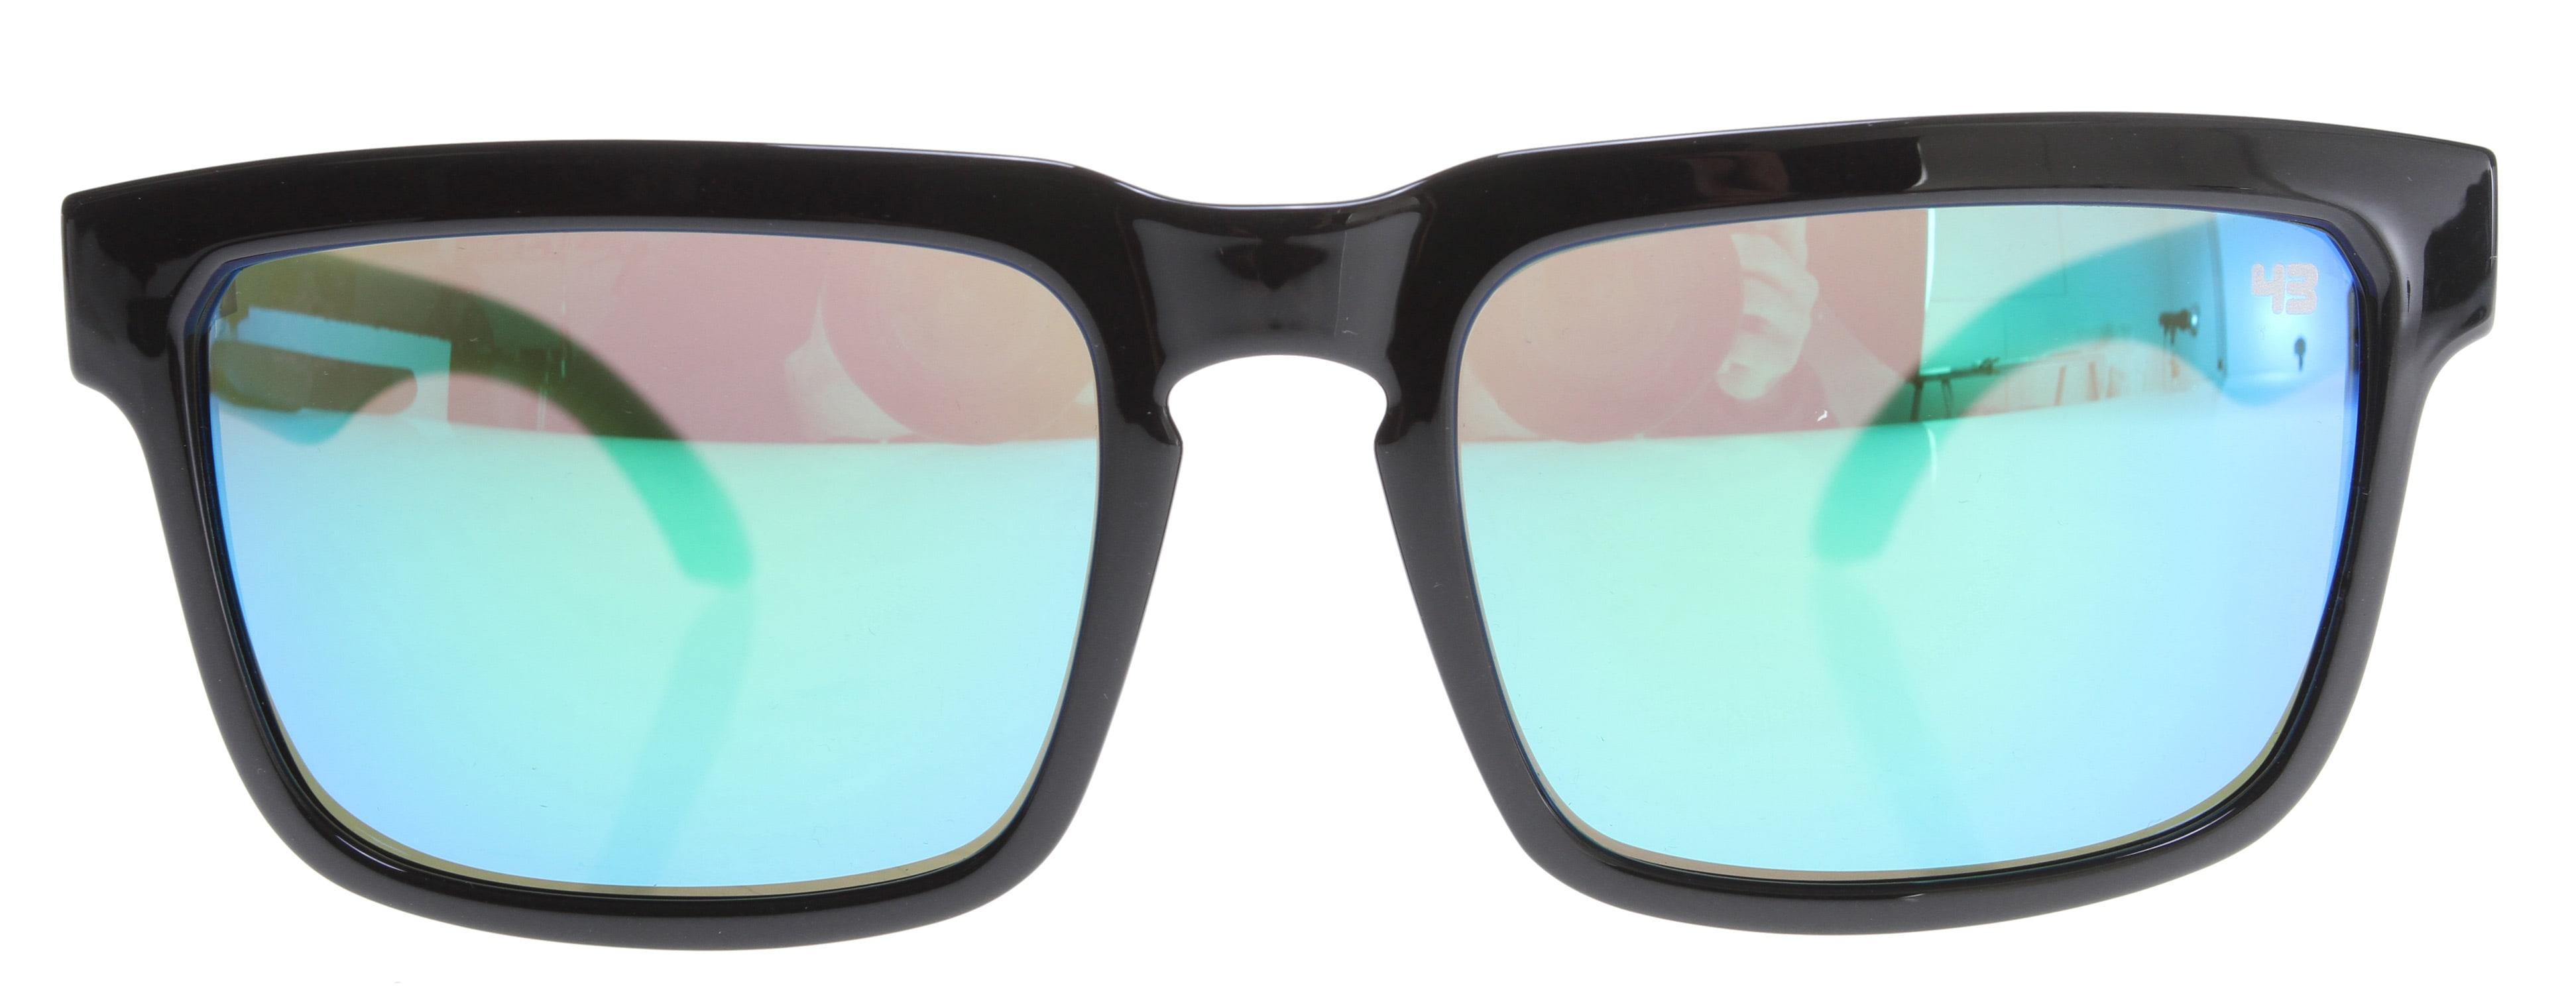 38775549ea0 Spy Helm Ken Block Assault Sunglasses - thumbnail 3